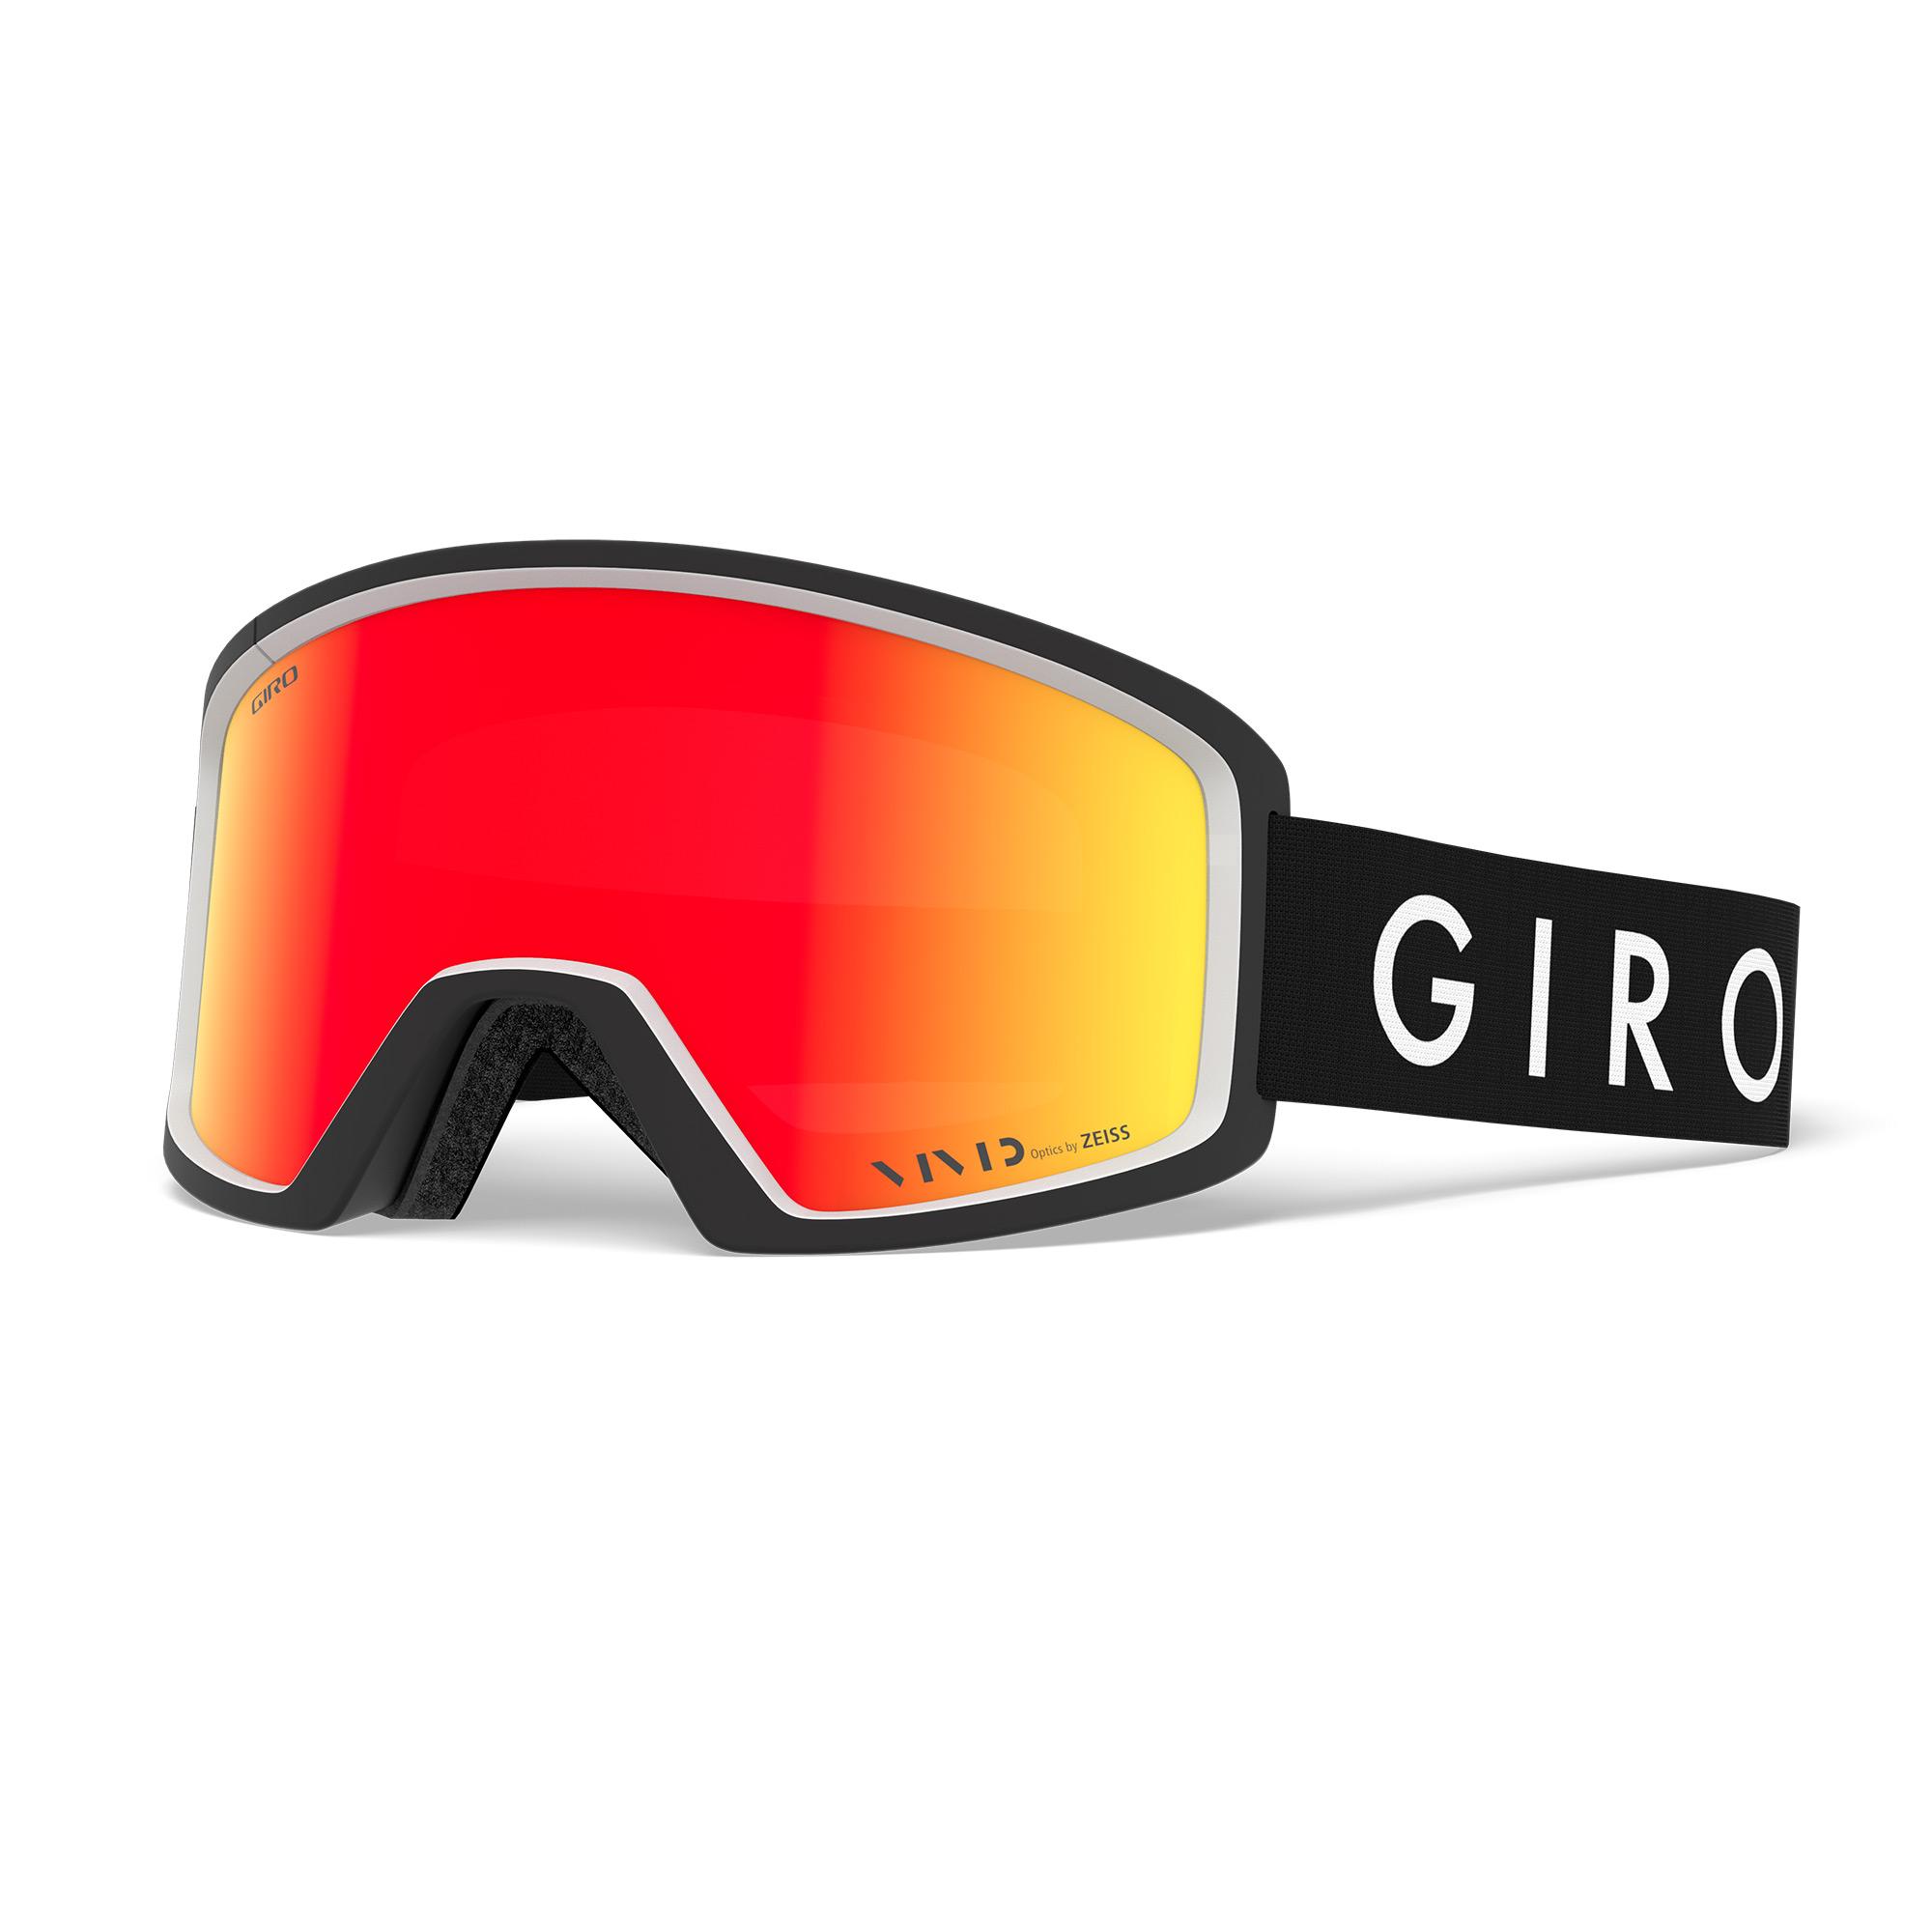 giro-blok-snow-goggle-black-core-vivid-ember-7083116-hero.jpg